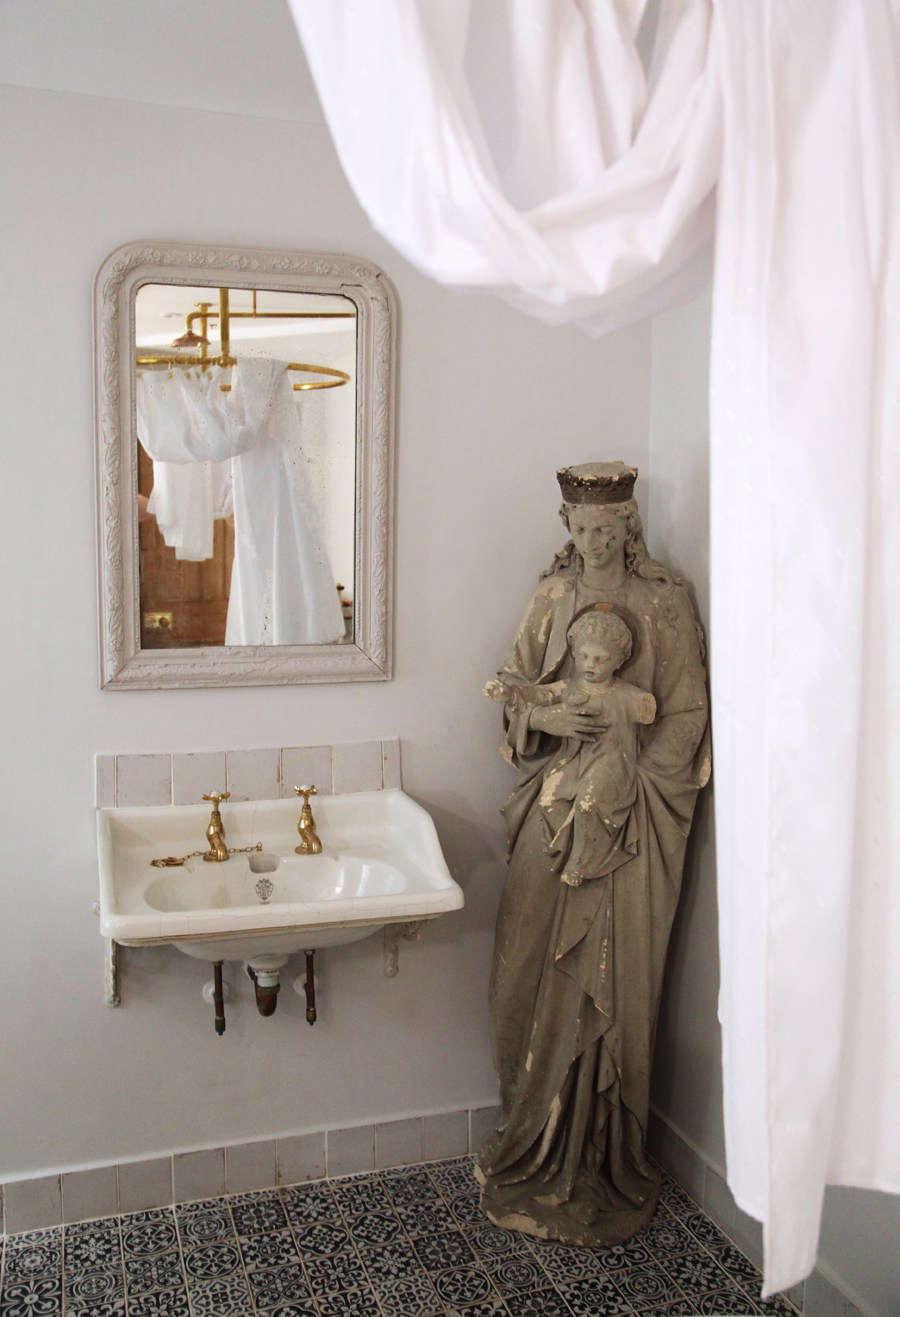 at berdoulat & breakfast in bath, a venture from designer patrick williams, 14